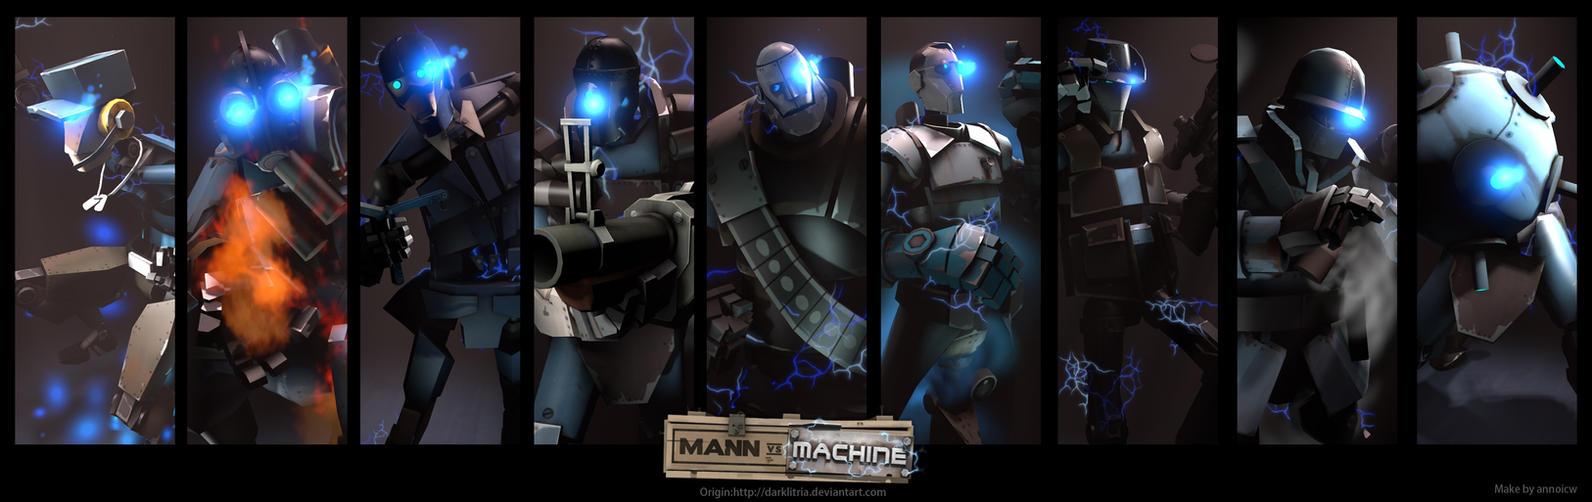 tf2 mann vs machine